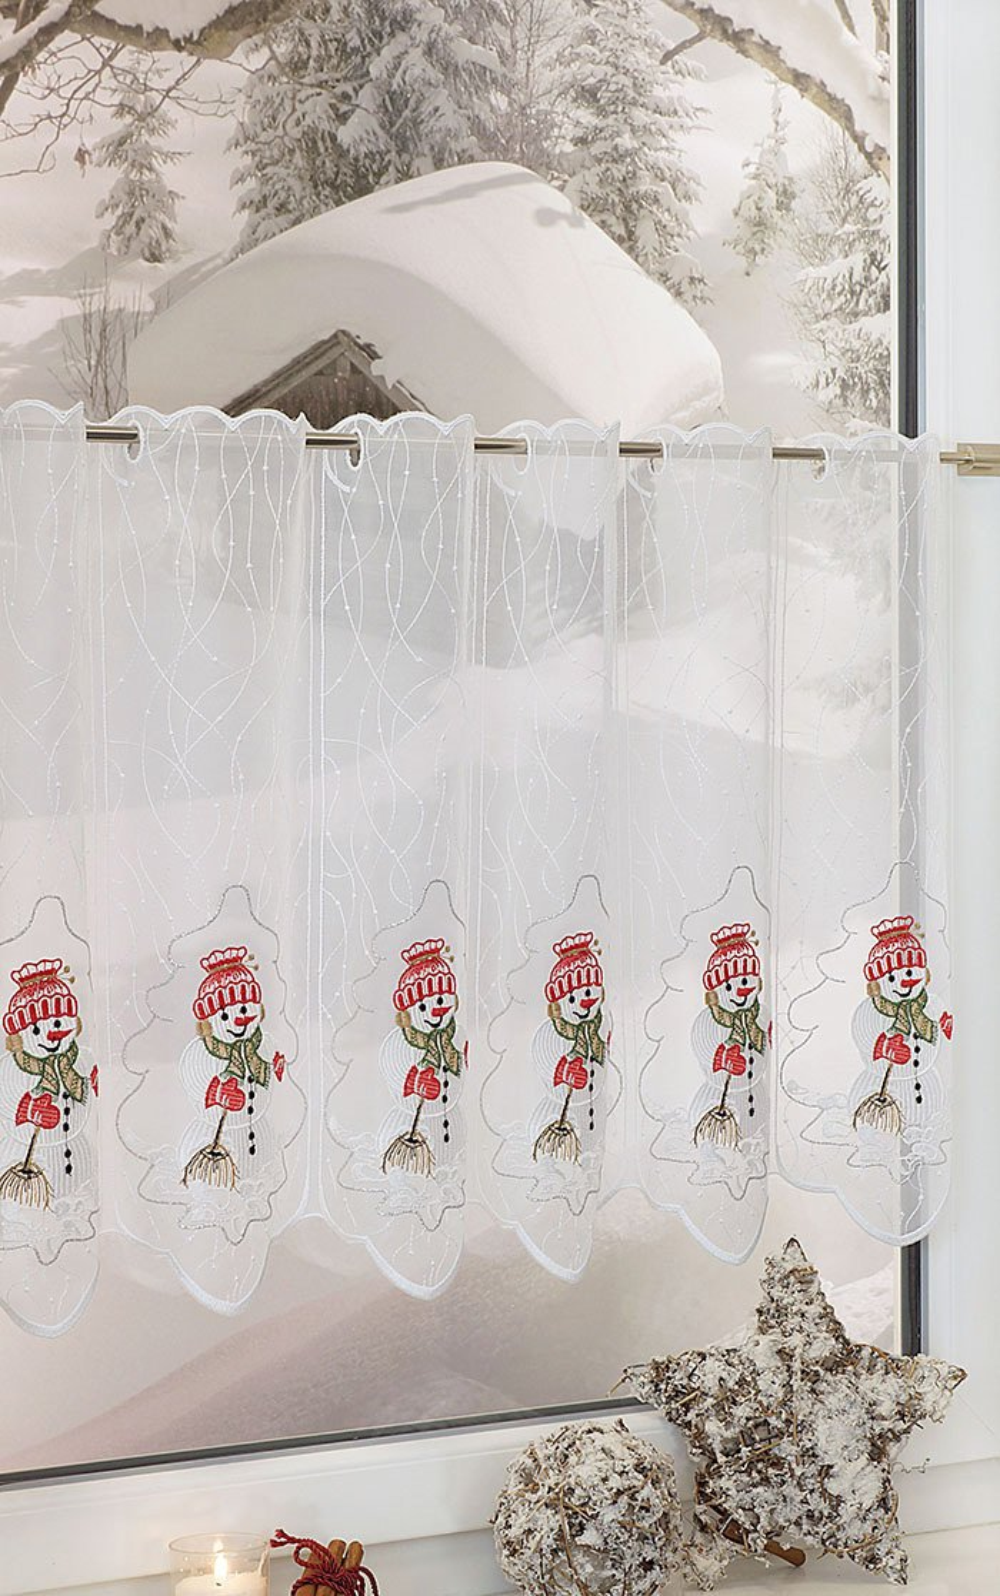 plauener spitze scheibengardinen snowman kaminrot ebay. Black Bedroom Furniture Sets. Home Design Ideas